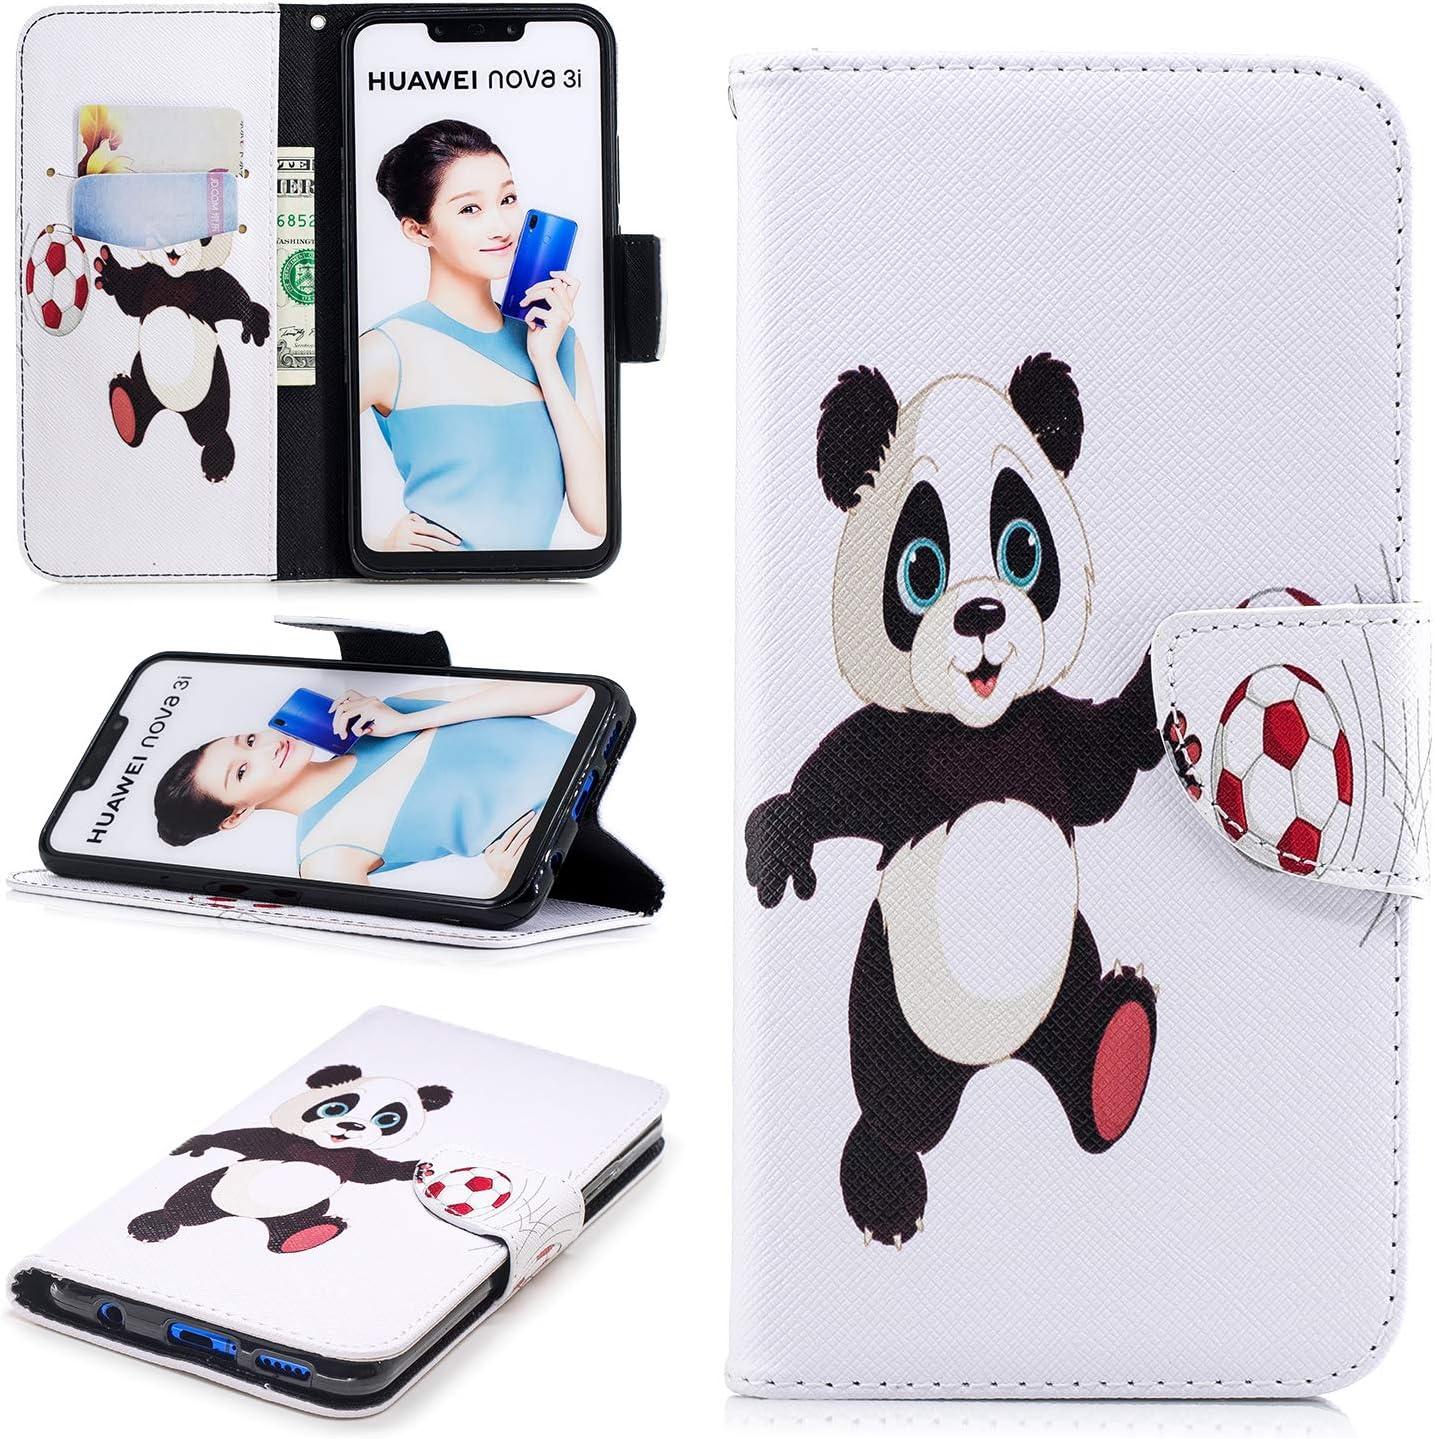 Ostop Brieftasche Leder Hülle Für Huawei P Smart Plus Elektronik